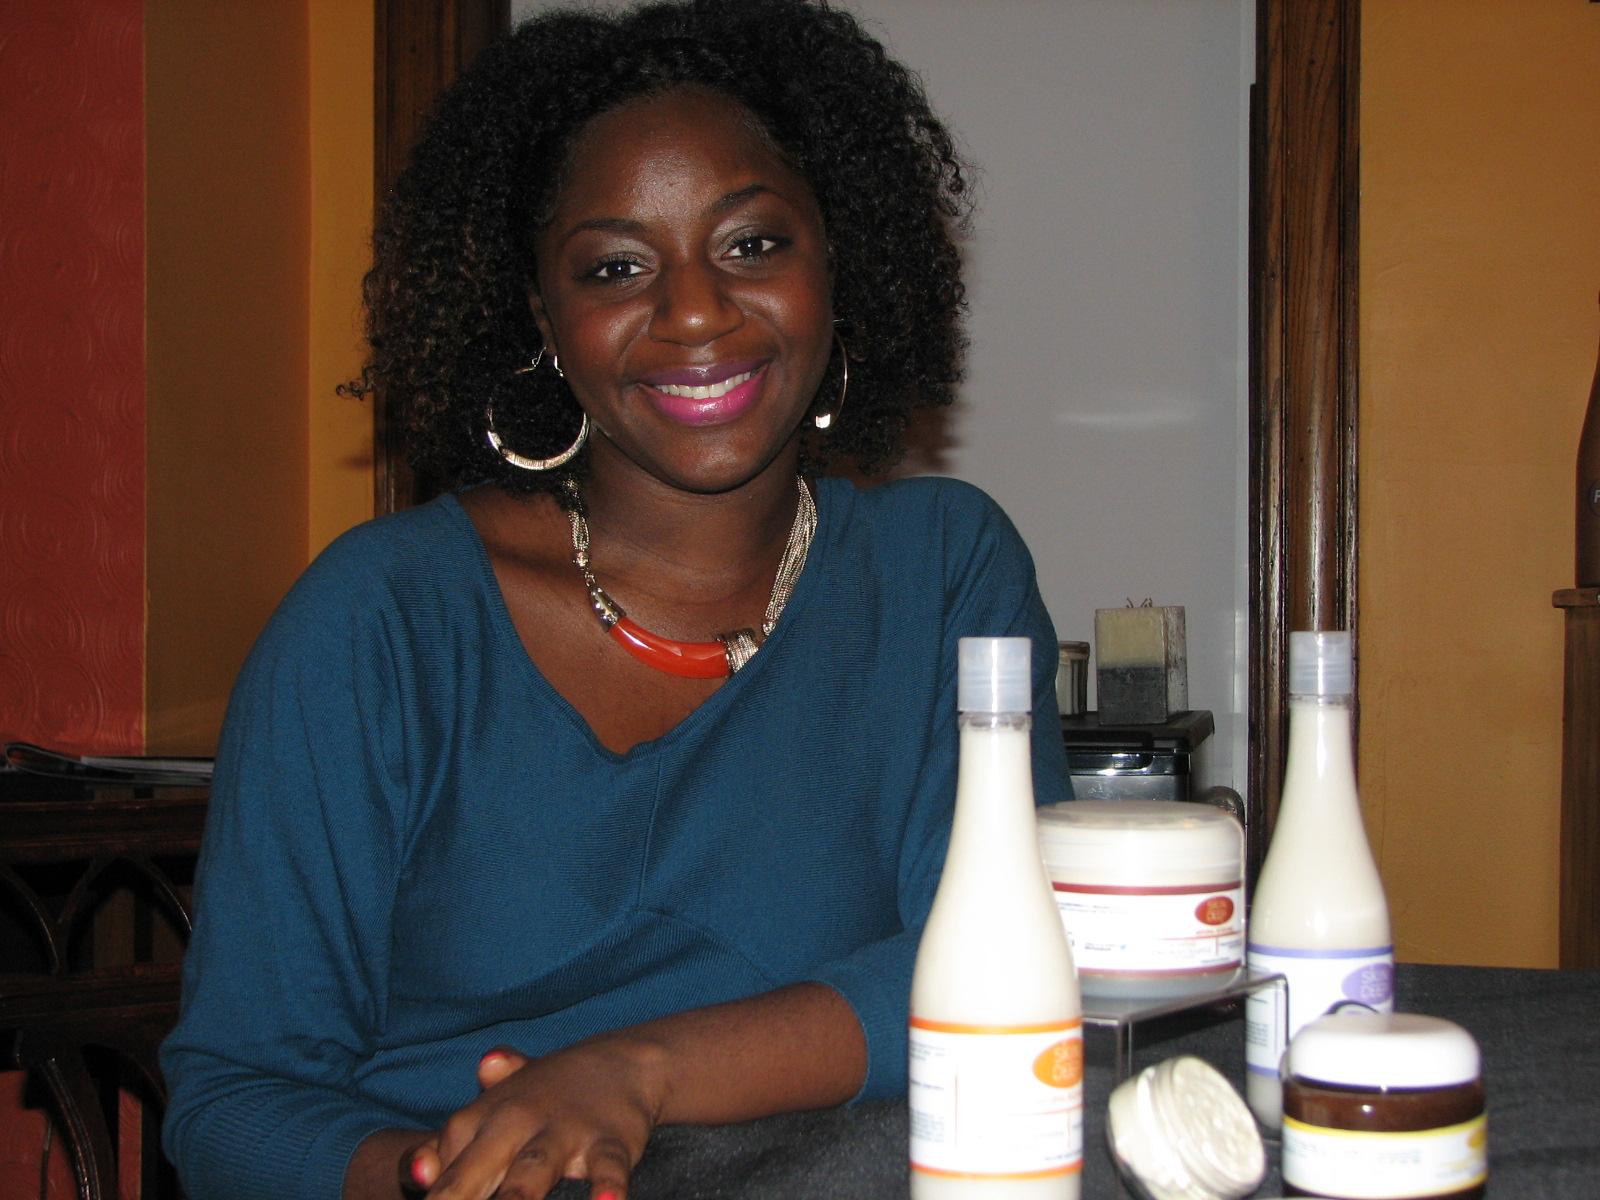 Dominique Convington, owner of Skin Deep Natural Body Care